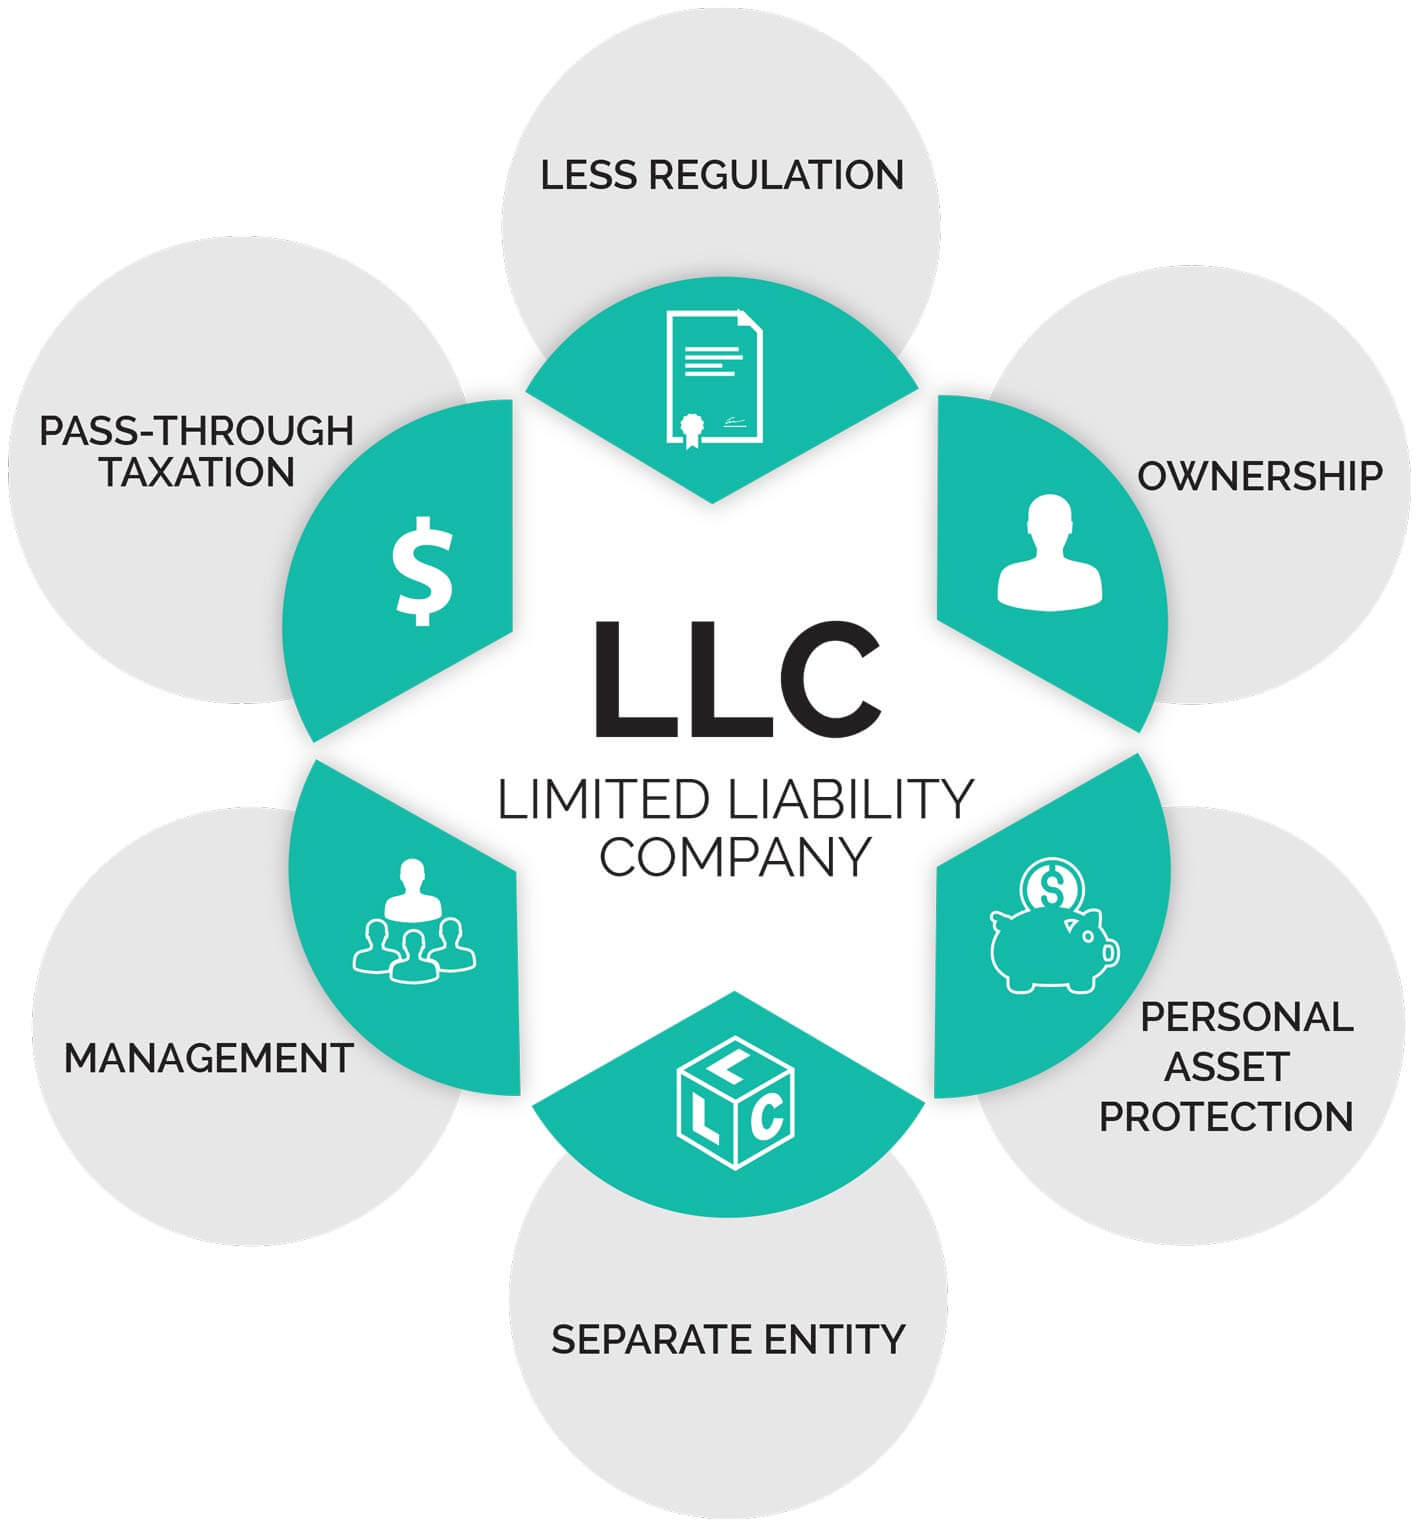 llc advantages and disadvantages.jpeg